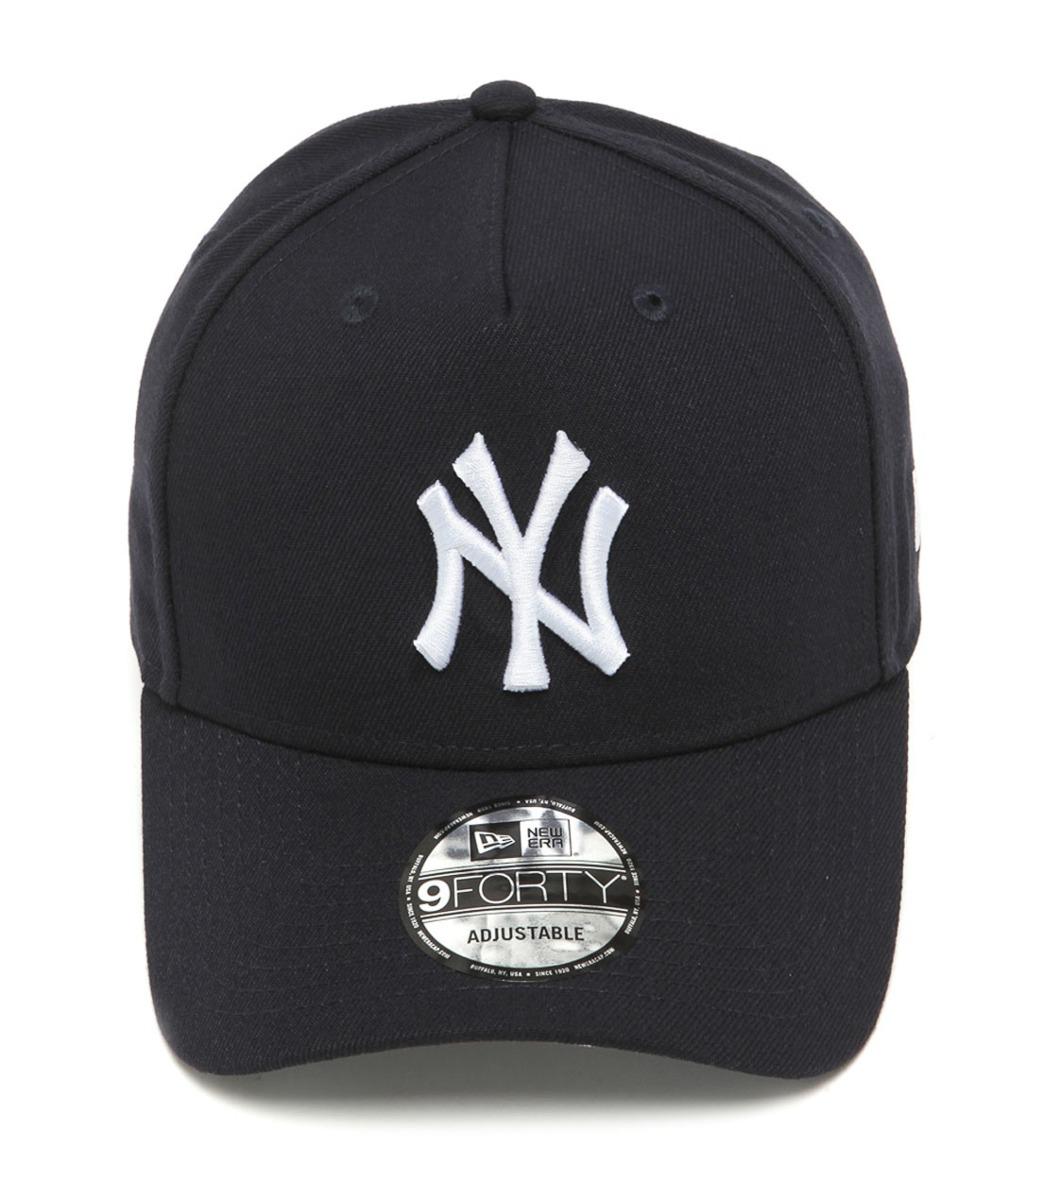 ... aba curva a-frame squared new york yankees n... Carregando zoom... boné  new era new. Carregando zoom. d4fc0104d01